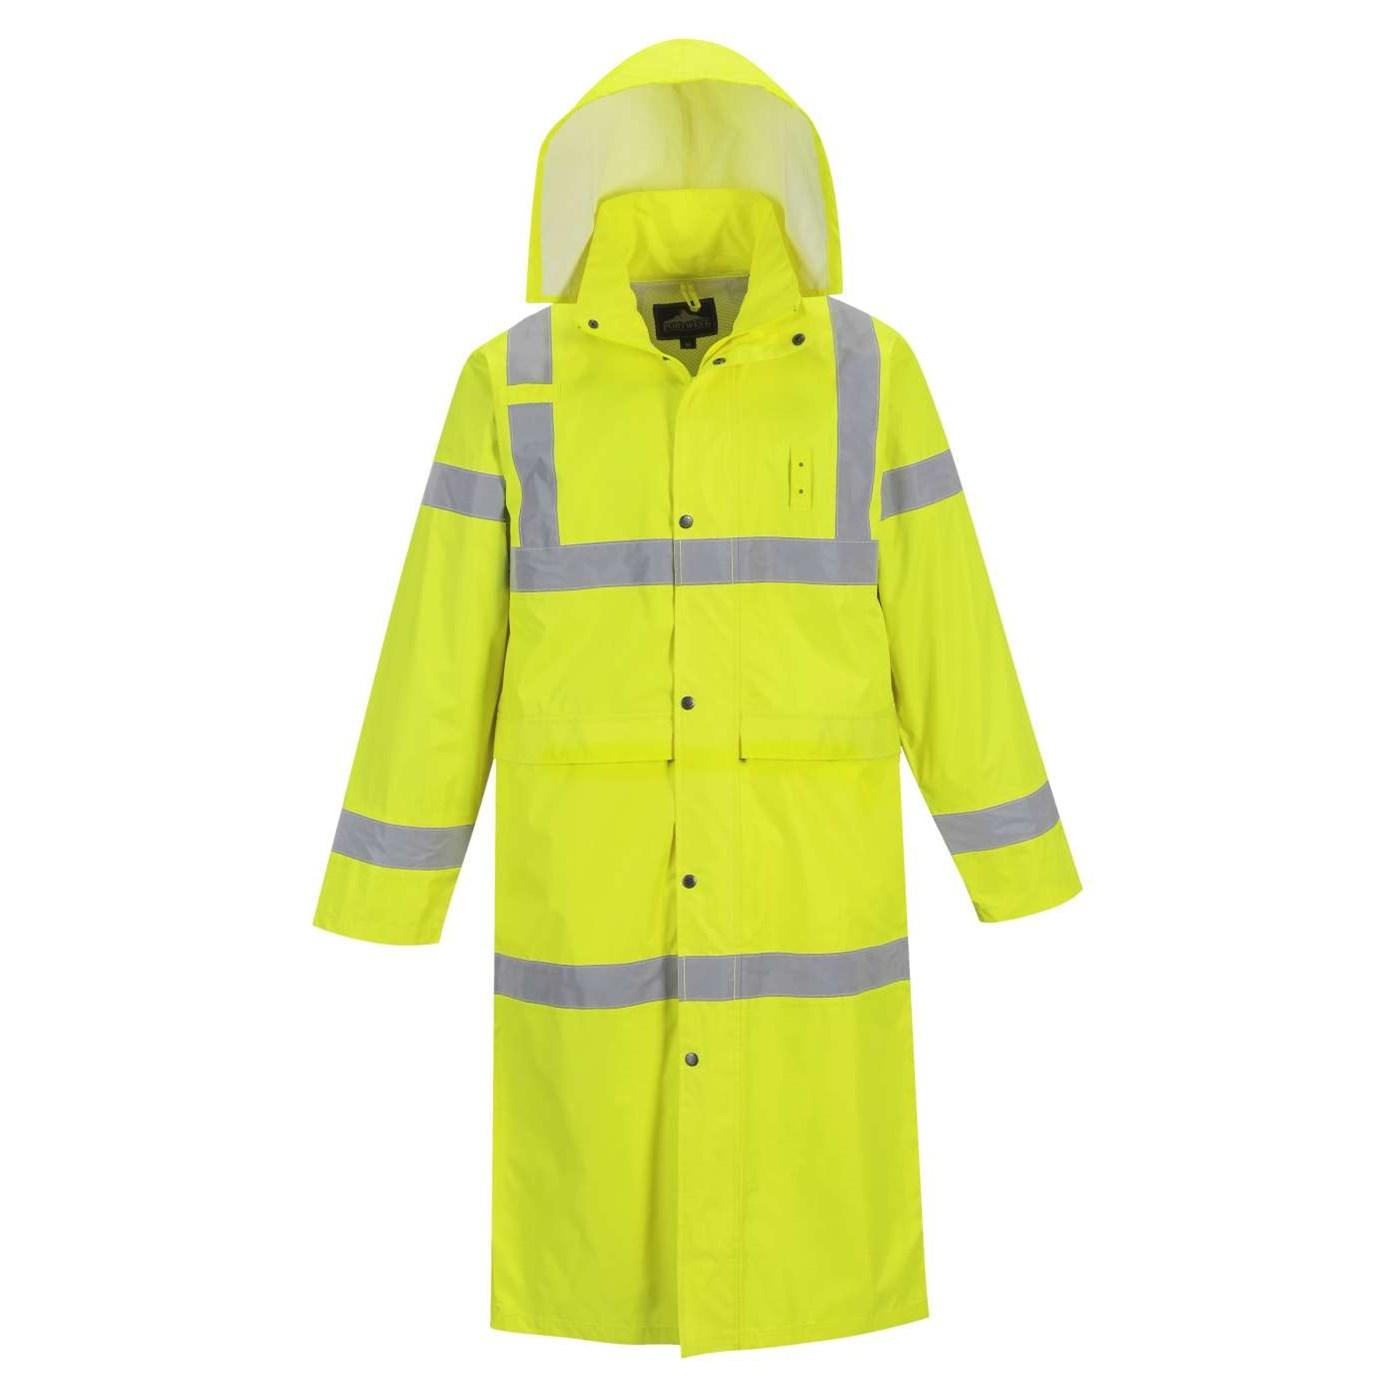 RESULT MEN/'S WORKWEAR JACKET LINED COAT HOOD DURABLE CLASSIC SMART WARM S-4XL